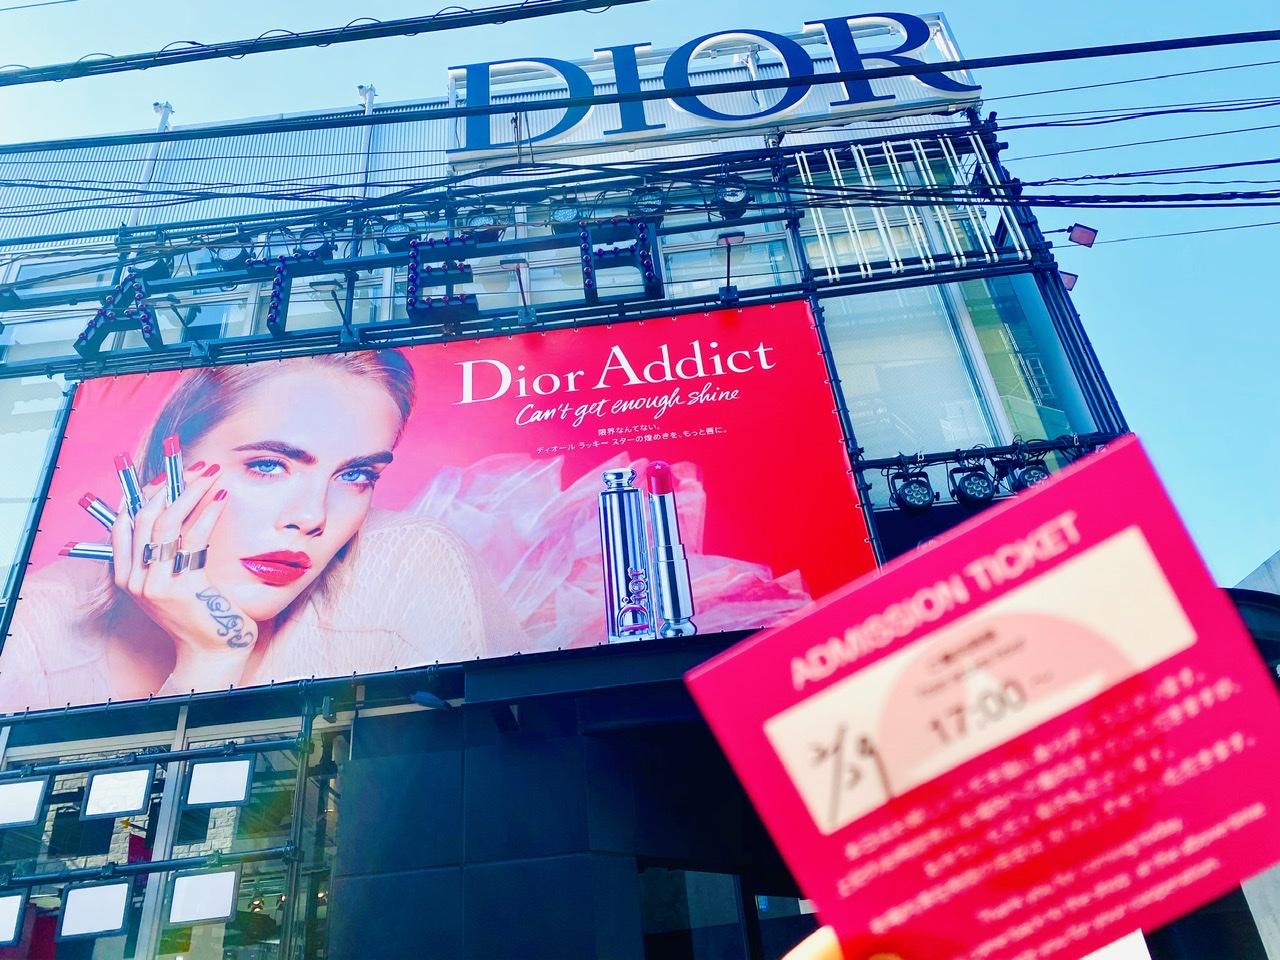 【Dior】豪華お土産付★新作リップをひと足早くお試し!連日大盛況のポップアップイベントへ♡_12